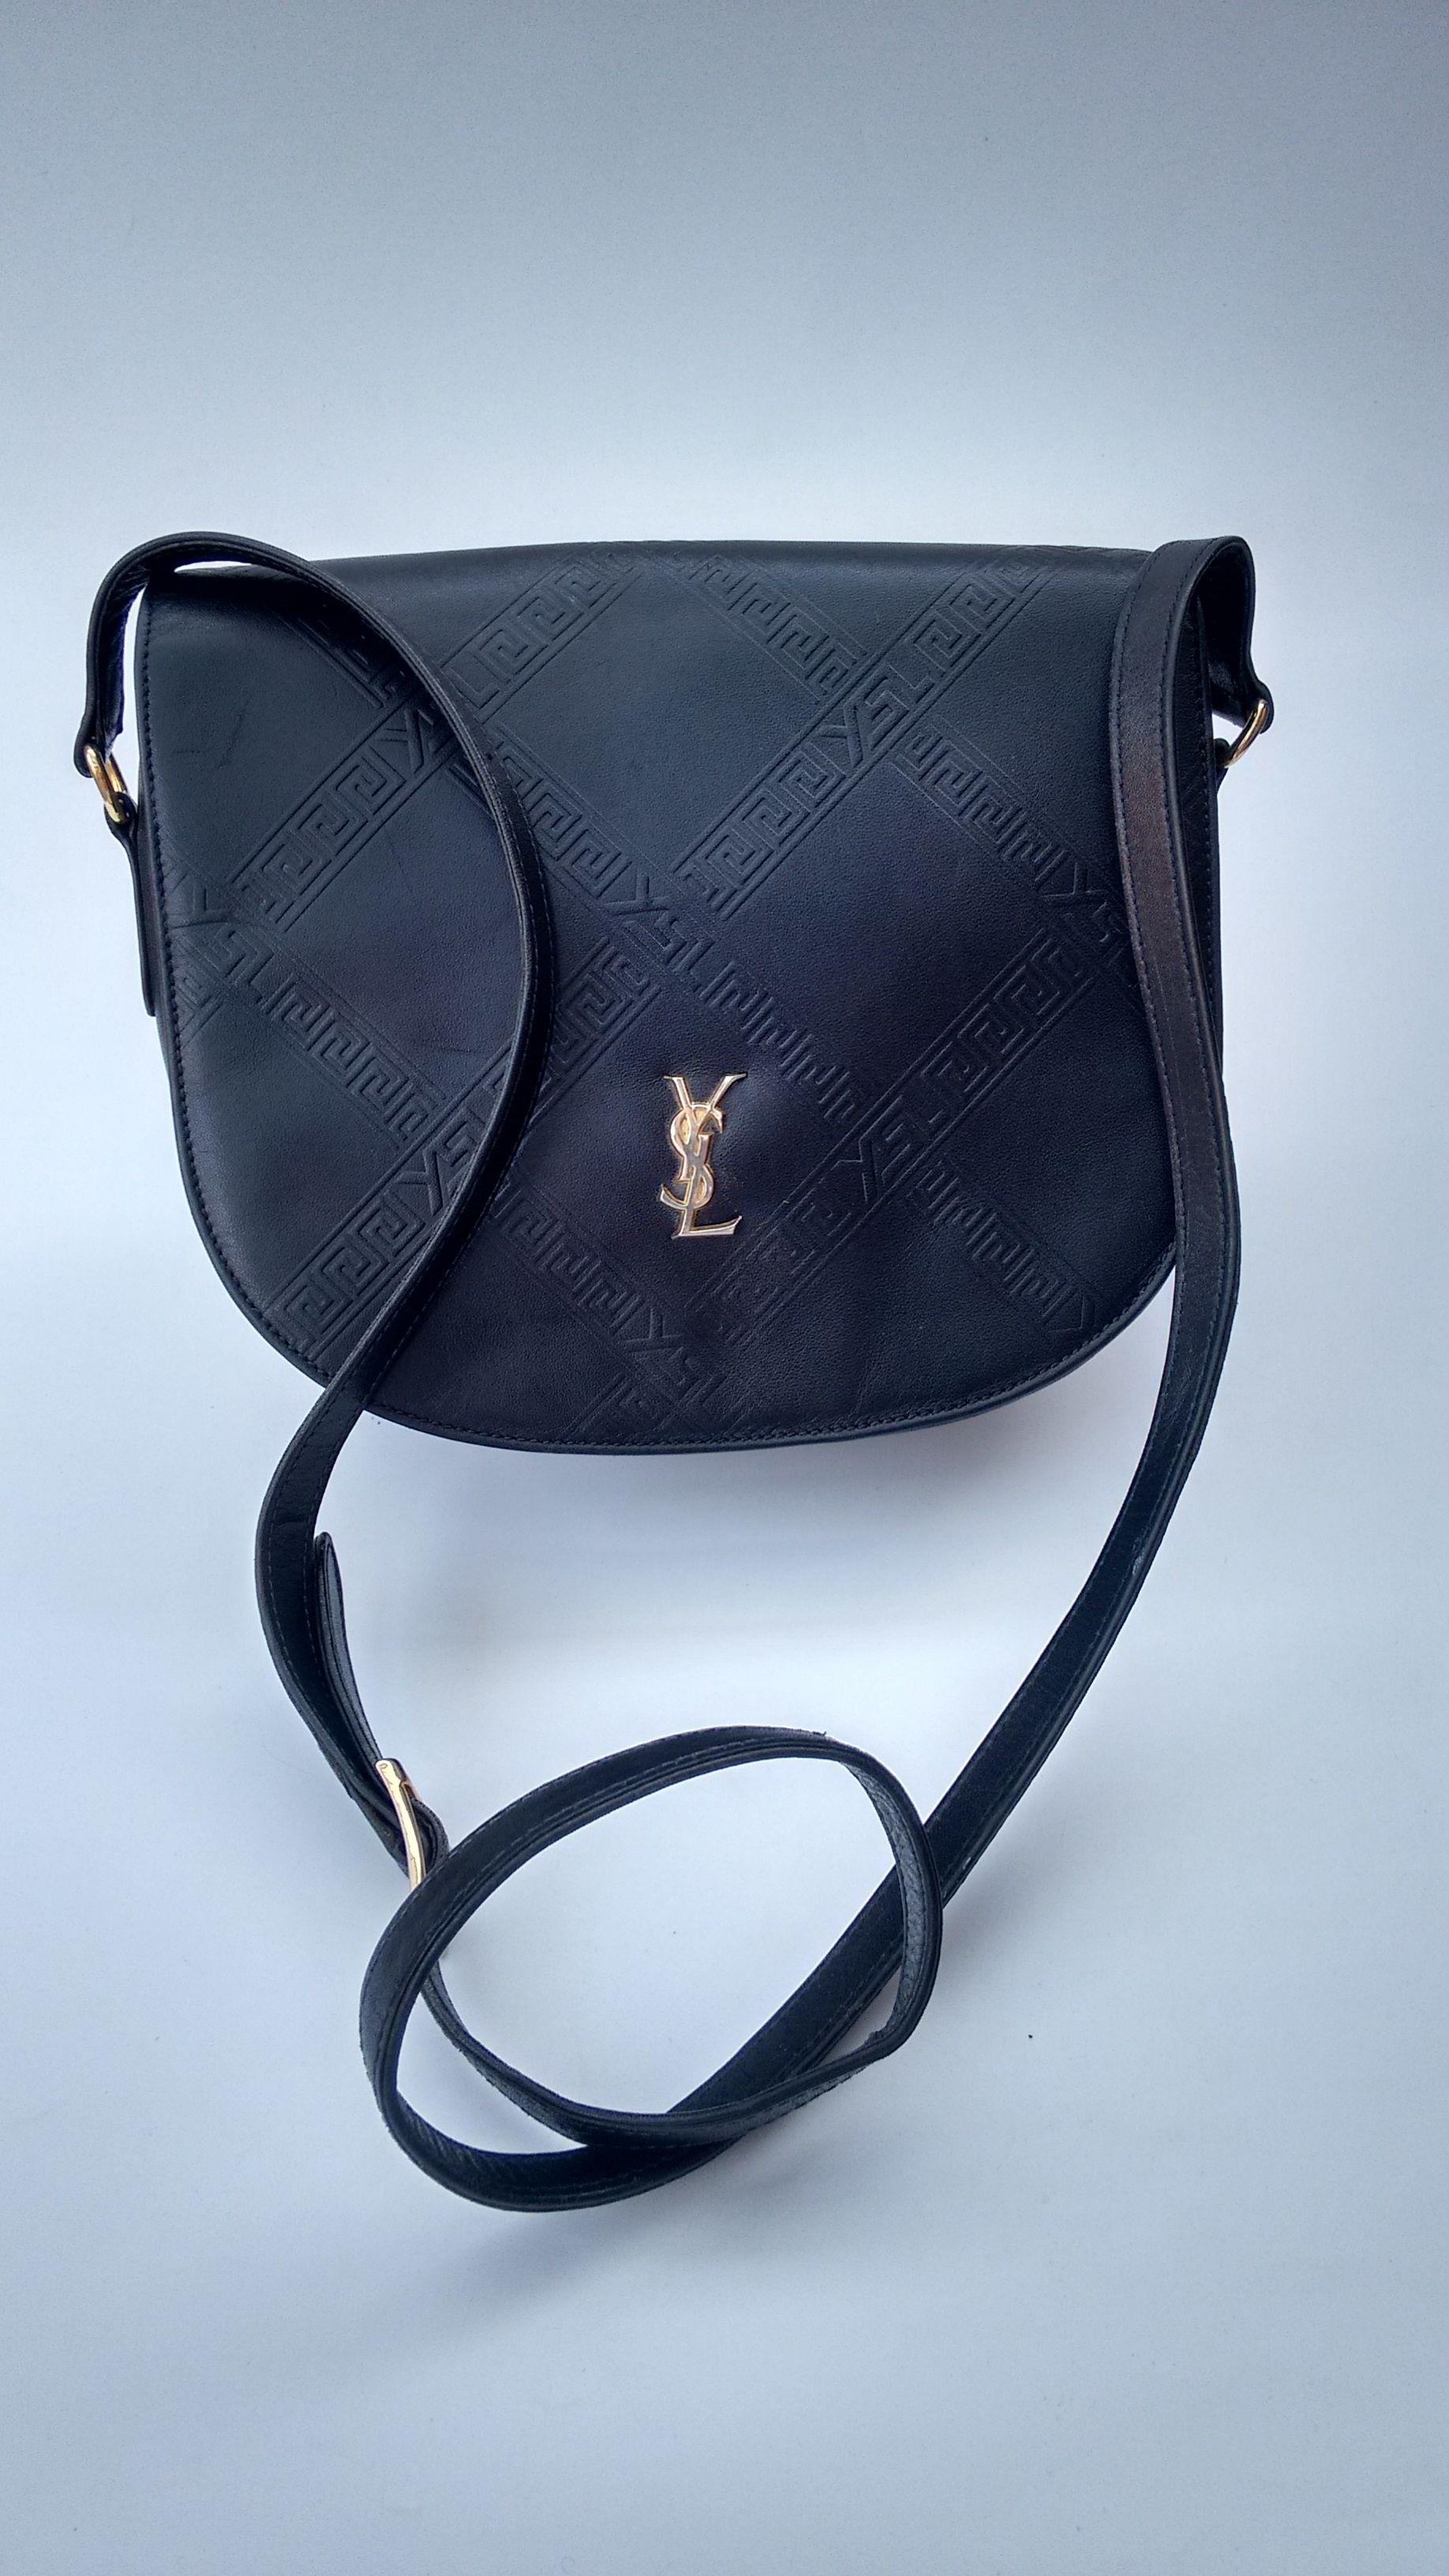 Ysl Bag Yves Saint Laurent Vintage Navy Dark Blue And White Leather Shoulder Crossbody Bag French Designer Purse Bags Fashion Bags Bags Designer